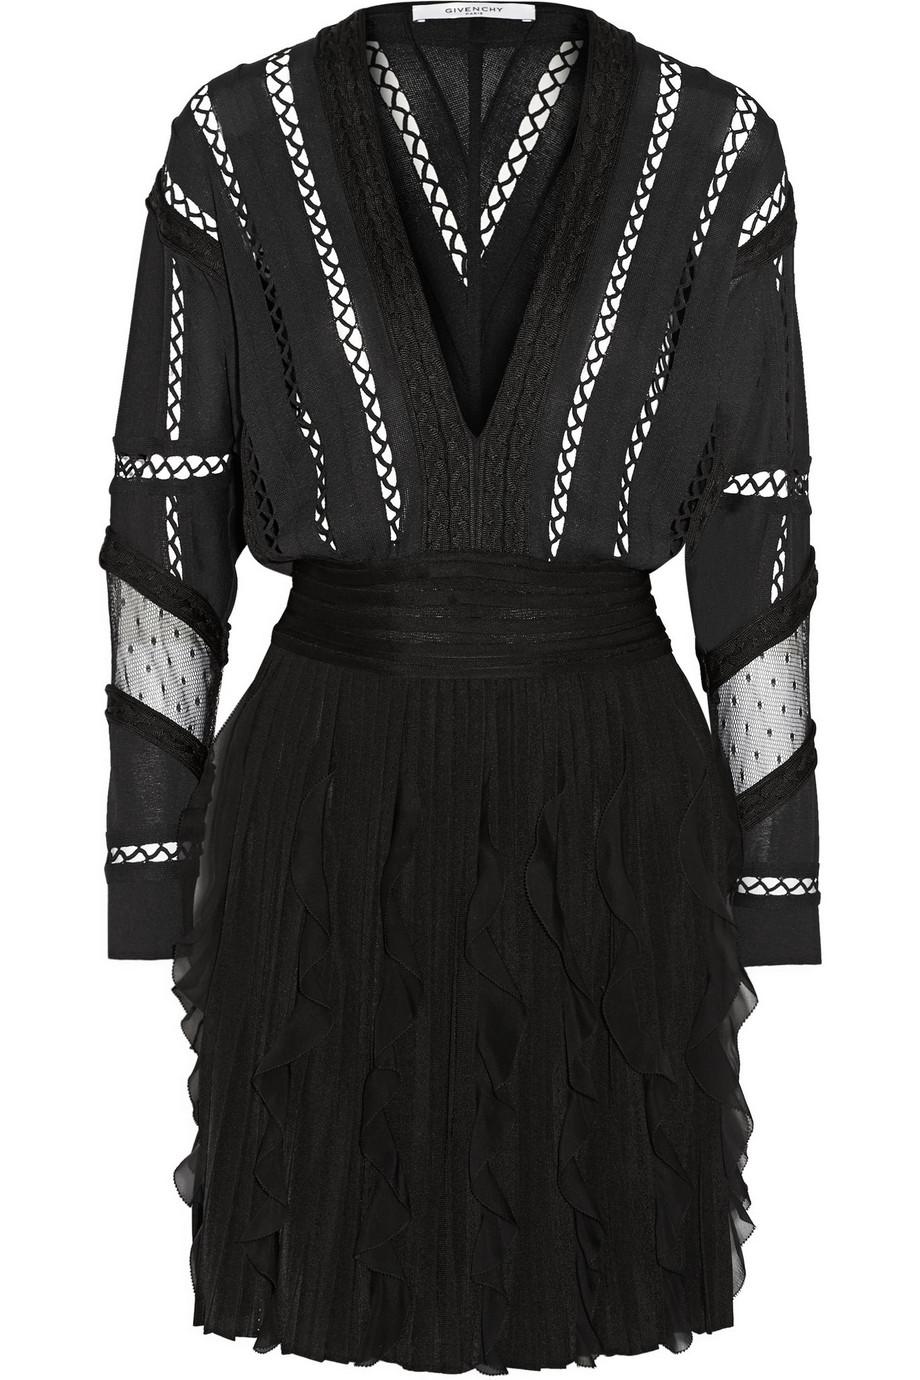 Givenchy Ruffled Silk Chiffon-Trimmed Jersey Mini Dress, Black, Women's - Dotted